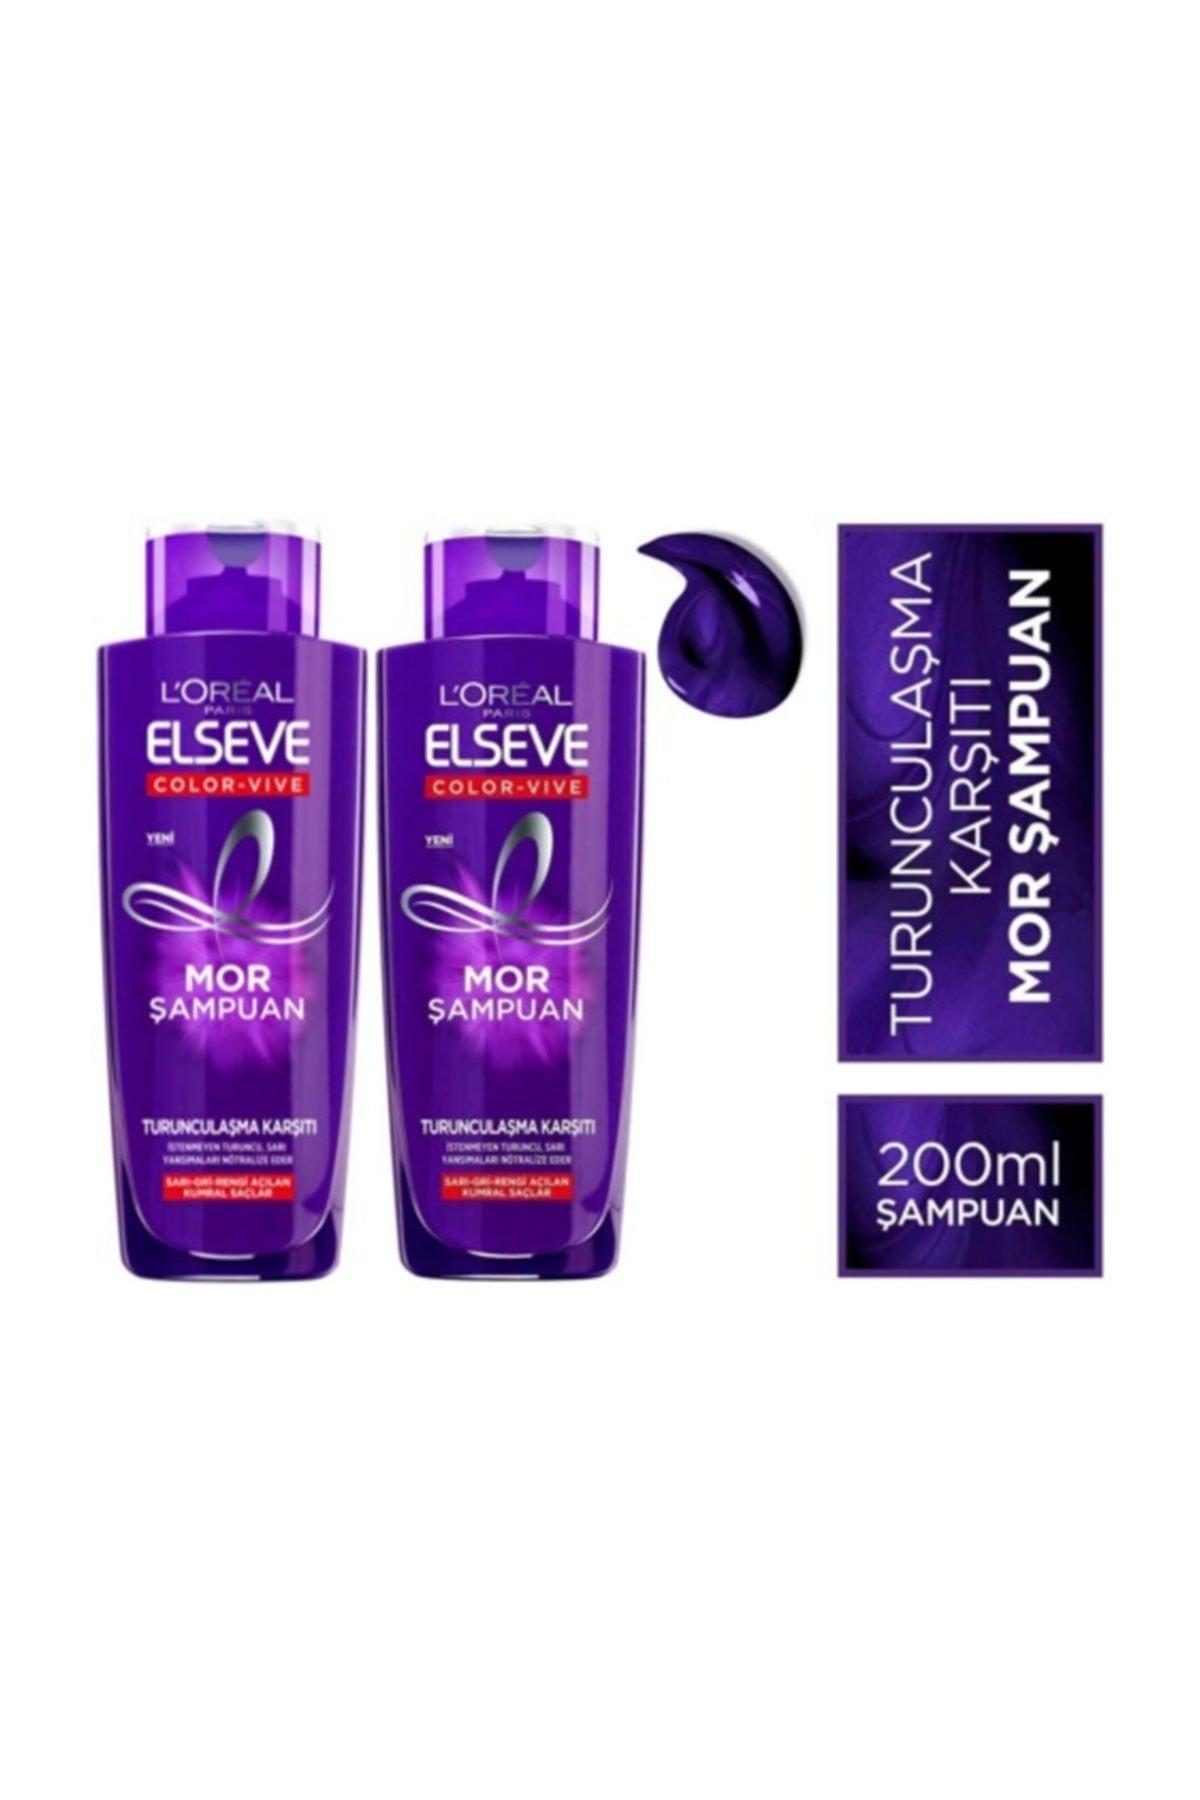 ELSEVE L'oréal Paris  Turunculaşma Karşıtı Mor Şampuan 200ml X 2 Adet 1